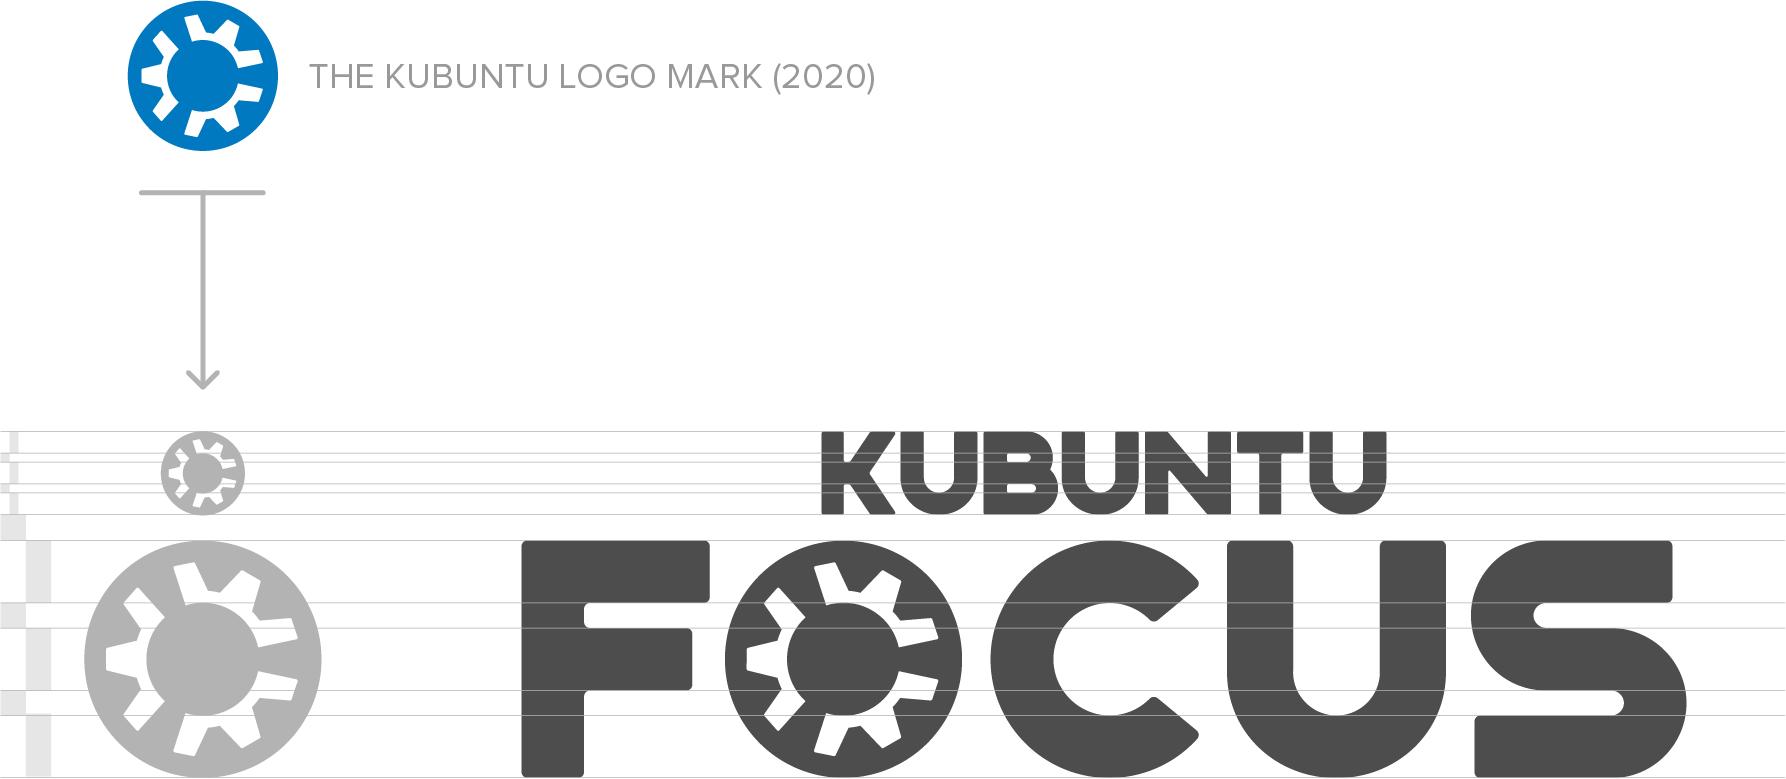 02-kfocus_brand-logo_construction